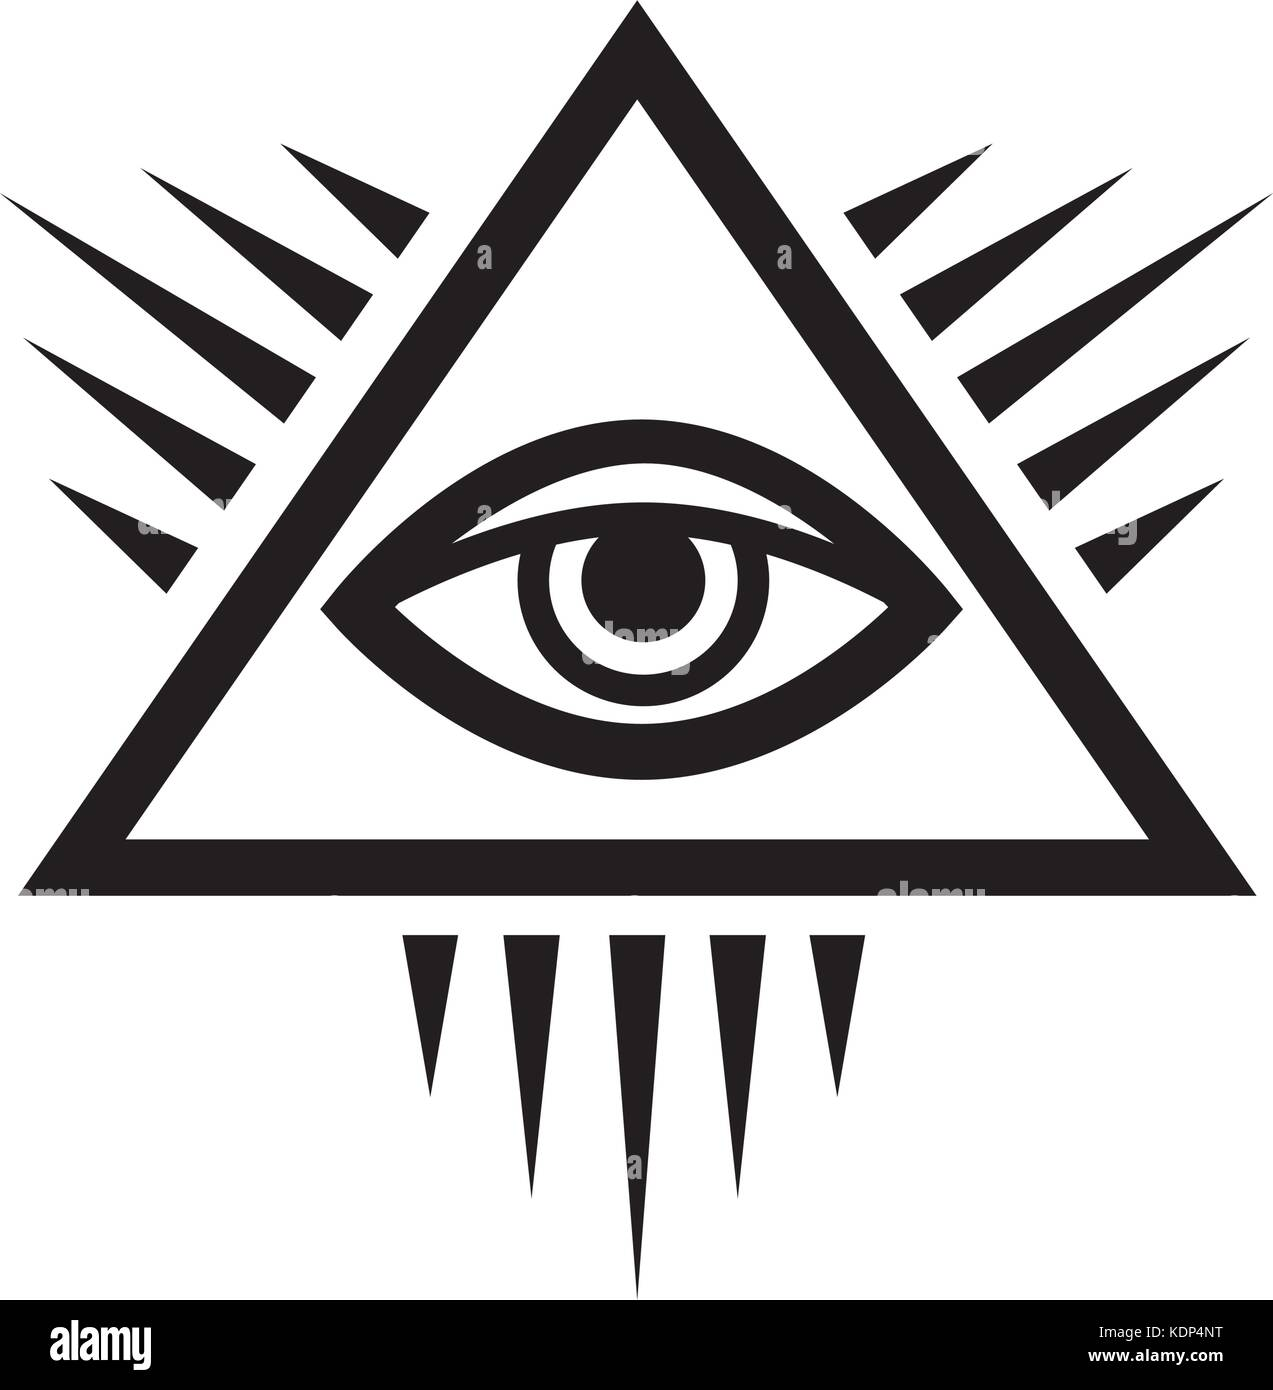 All seeing eye of god the eye of providence eye of omniscience all seeing eye of god the eye of providence eye of omniscience luminous delta ancient mystical sacral symbol of illuminati and freemasonry biocorpaavc